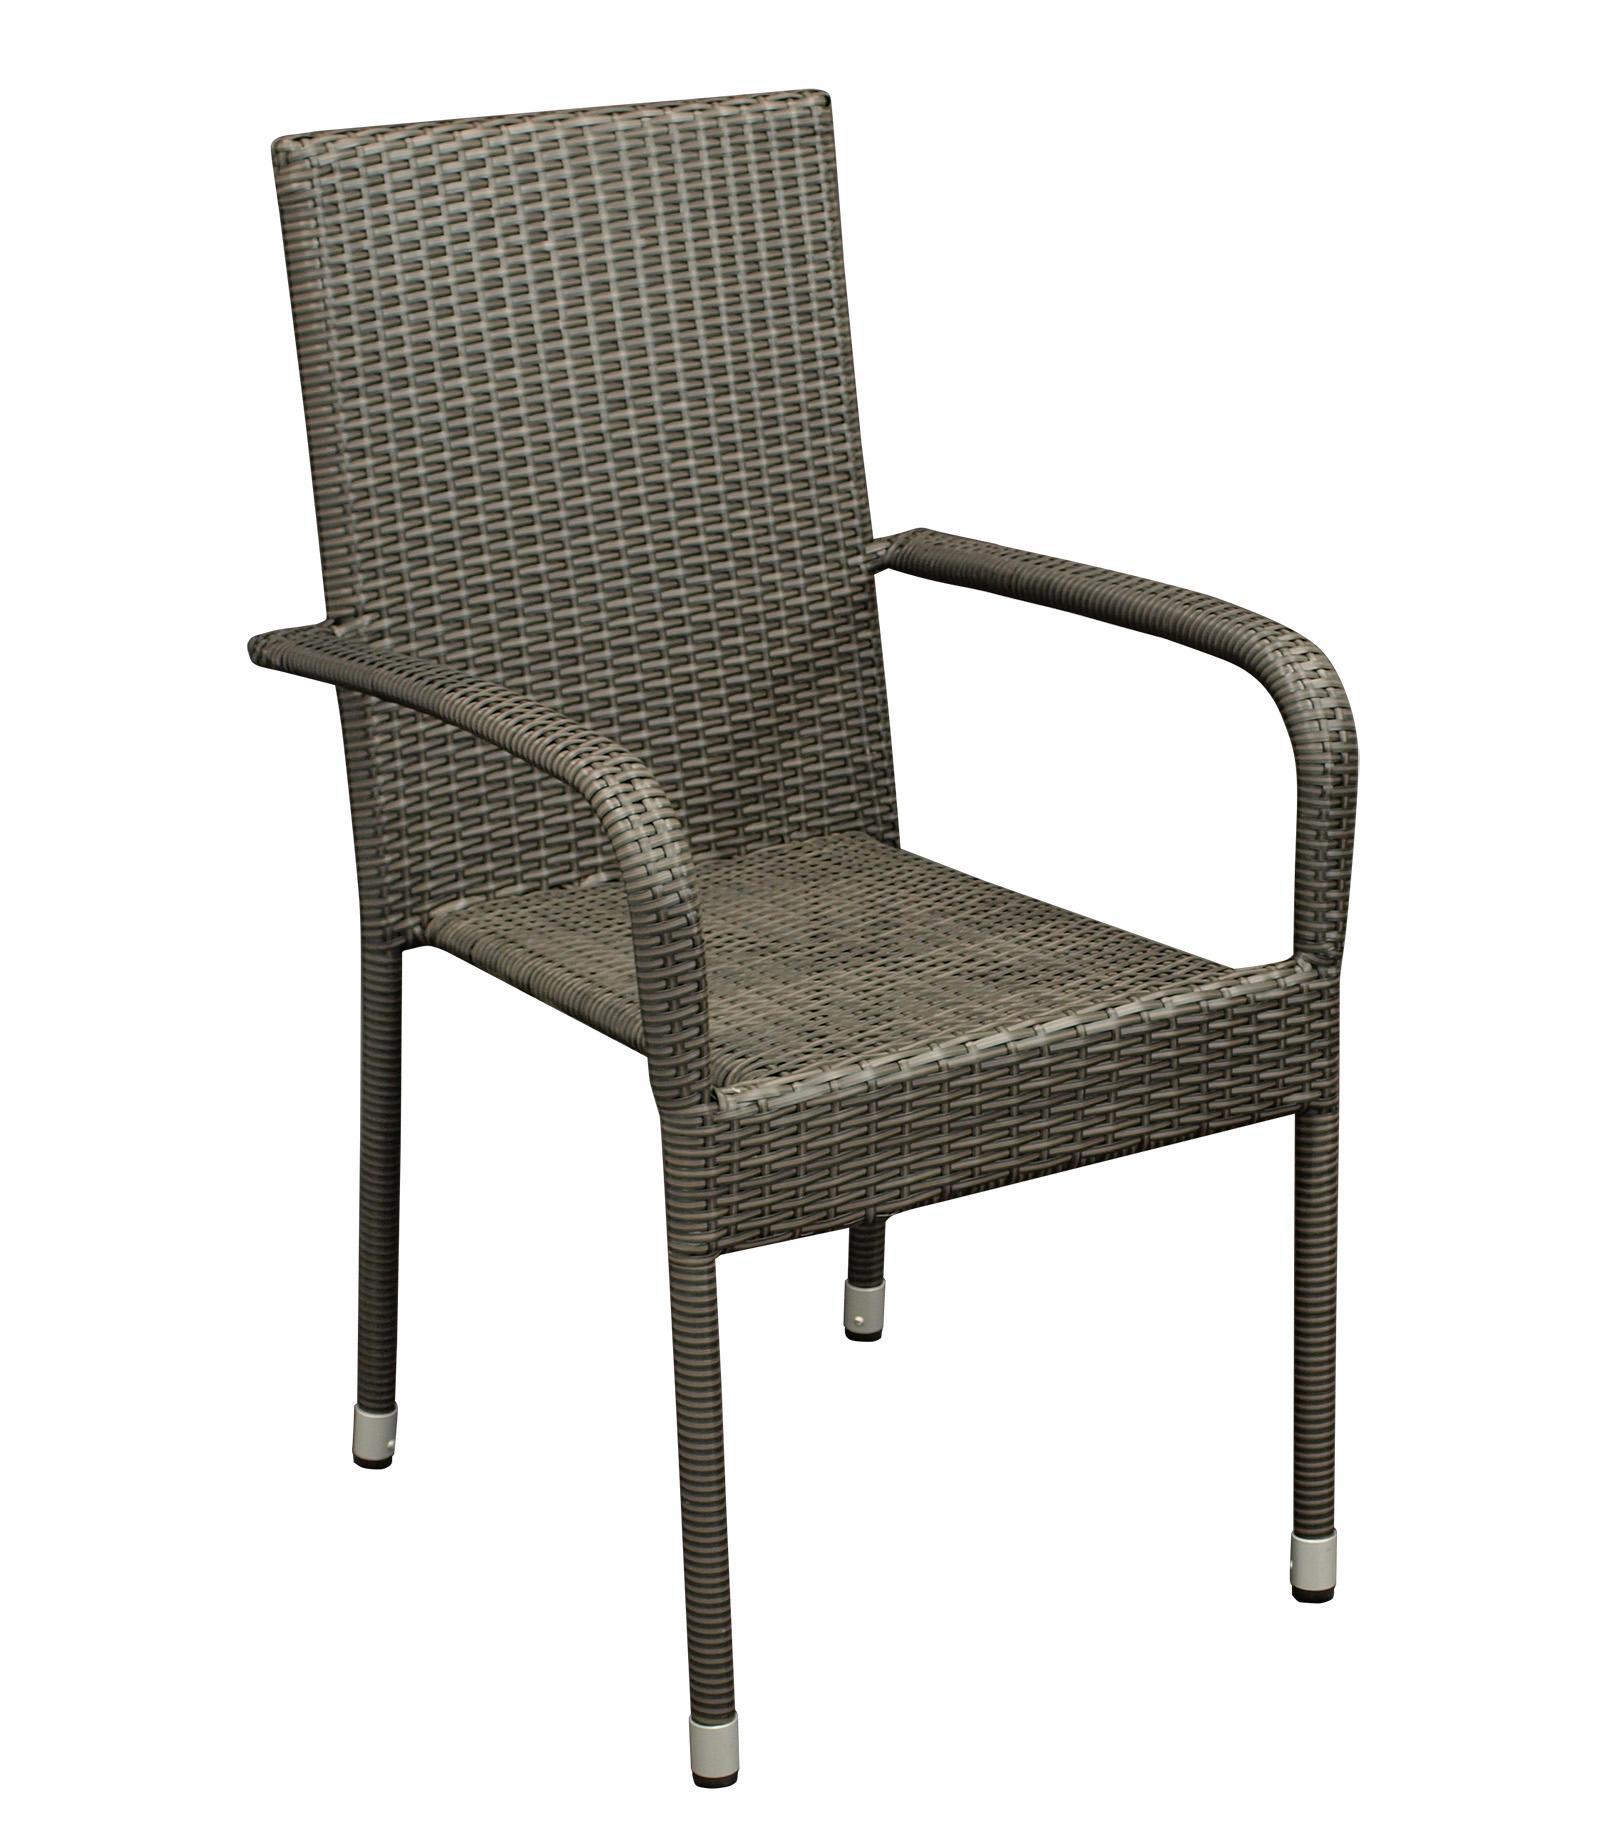 gartengarnitur sitzgruppe gartem bel garnitur gartenset alba rattan braun holz. Black Bedroom Furniture Sets. Home Design Ideas